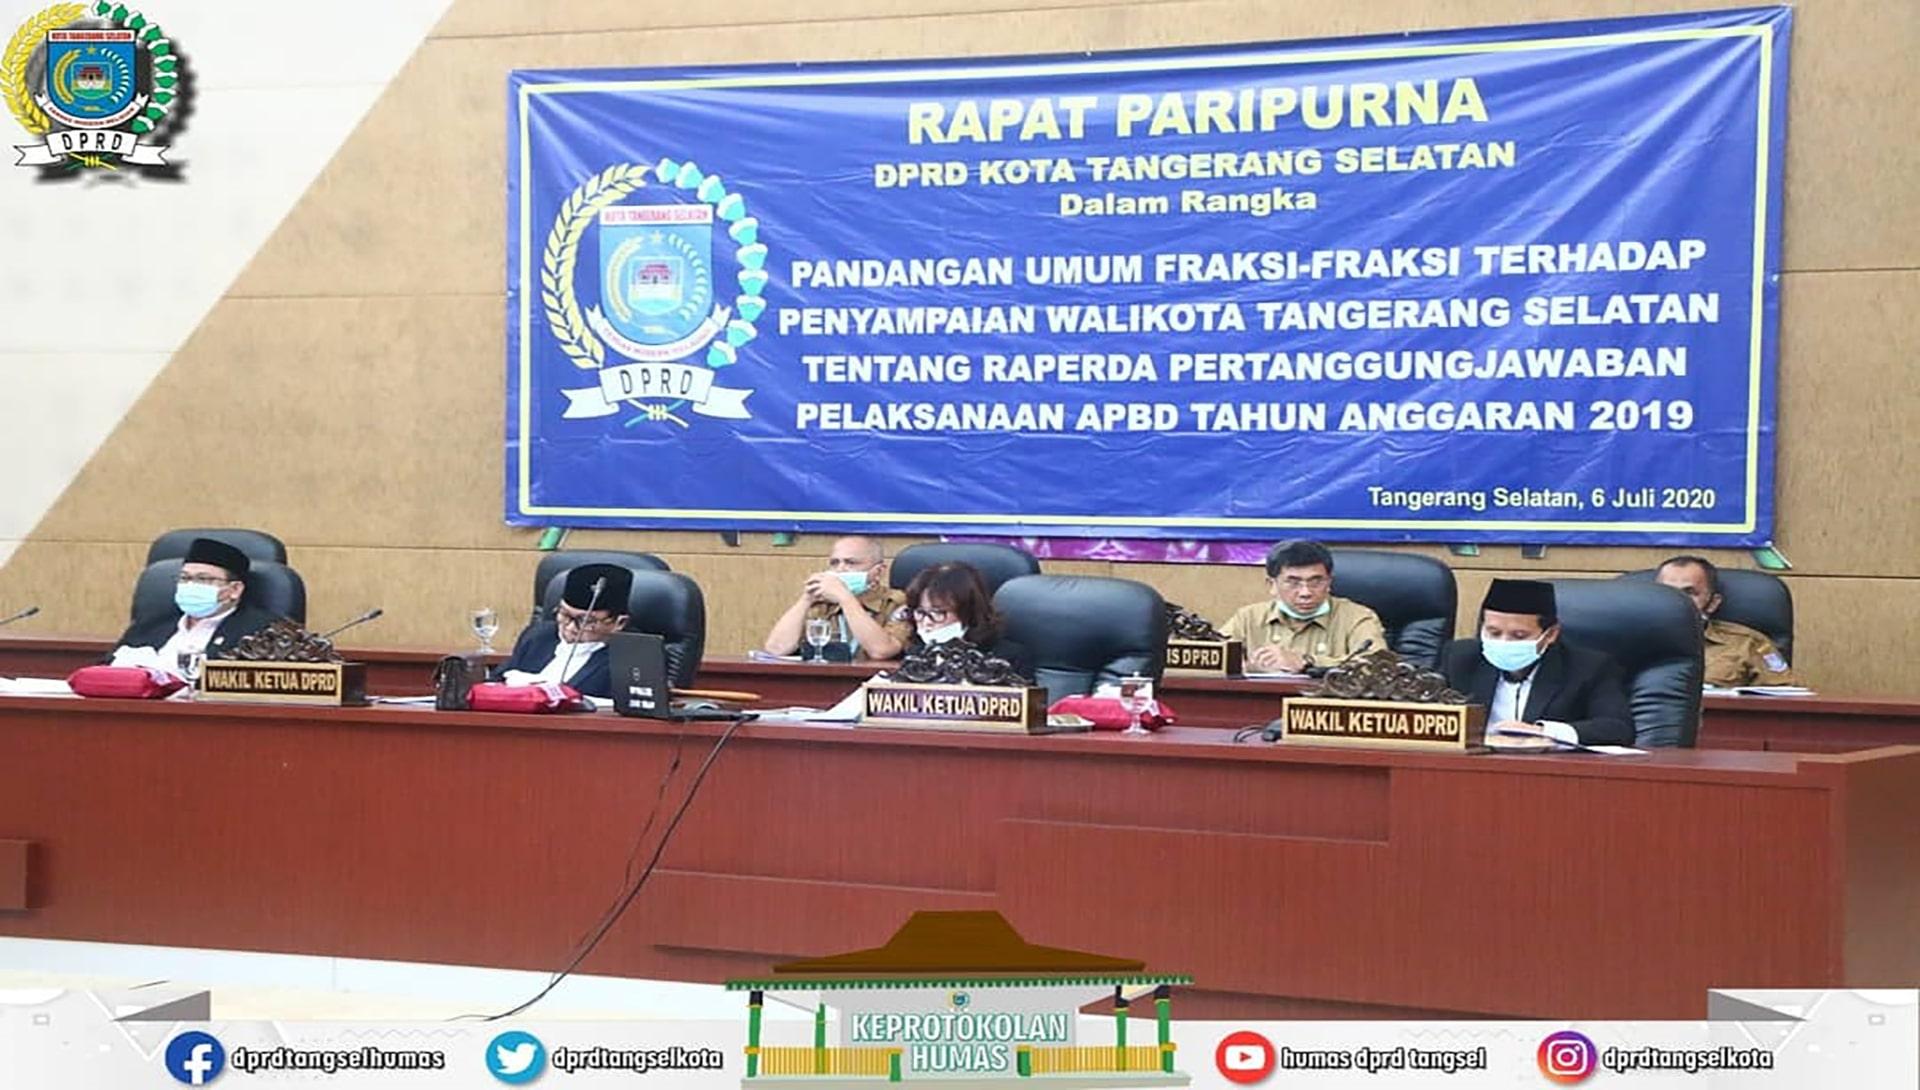 Paripurna Pandangan Umum Fraksi-Fraksi ttg Raperda APBD TA 2019